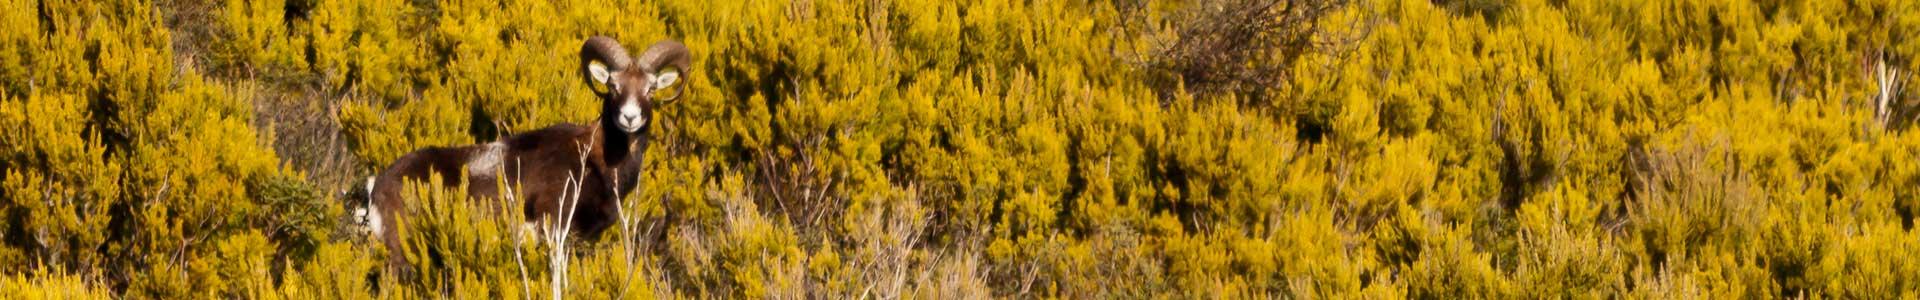 guide ambientali arcipelago toscano